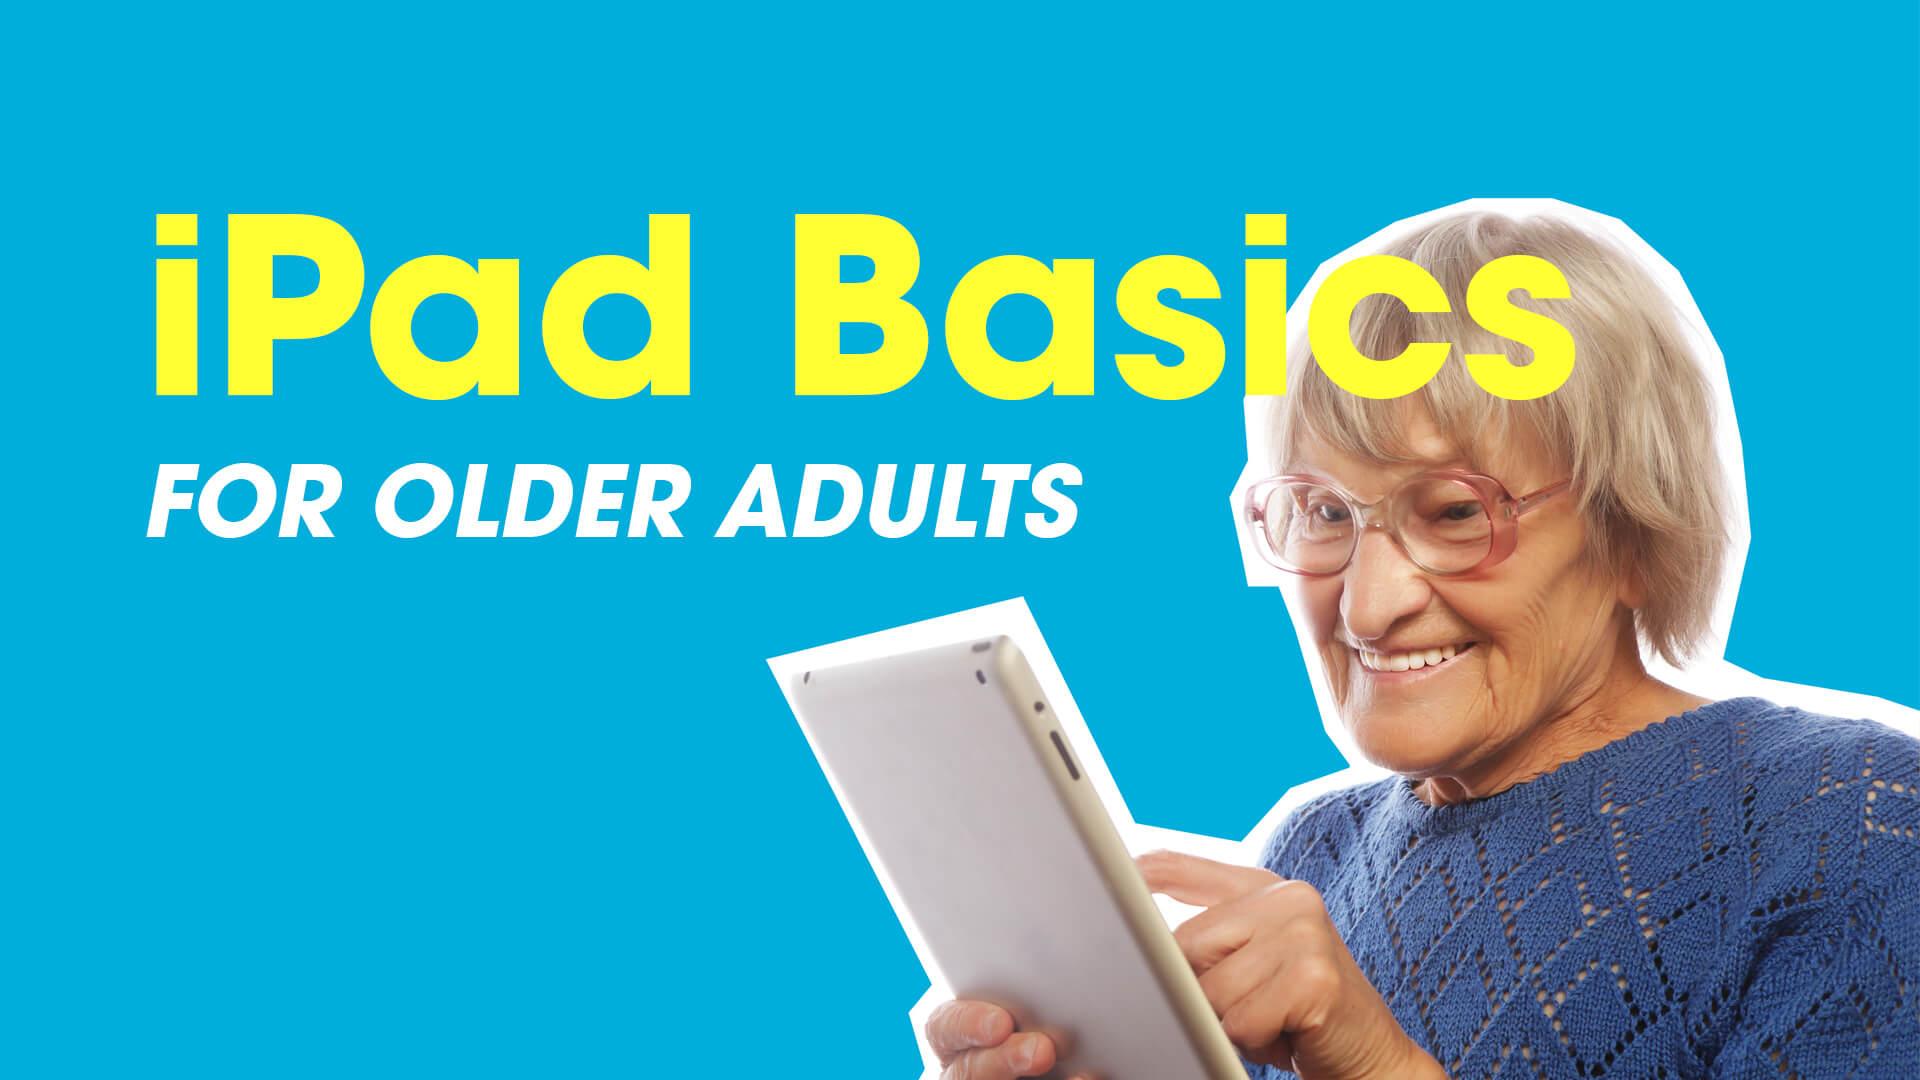 iPad Basics for Older Adults